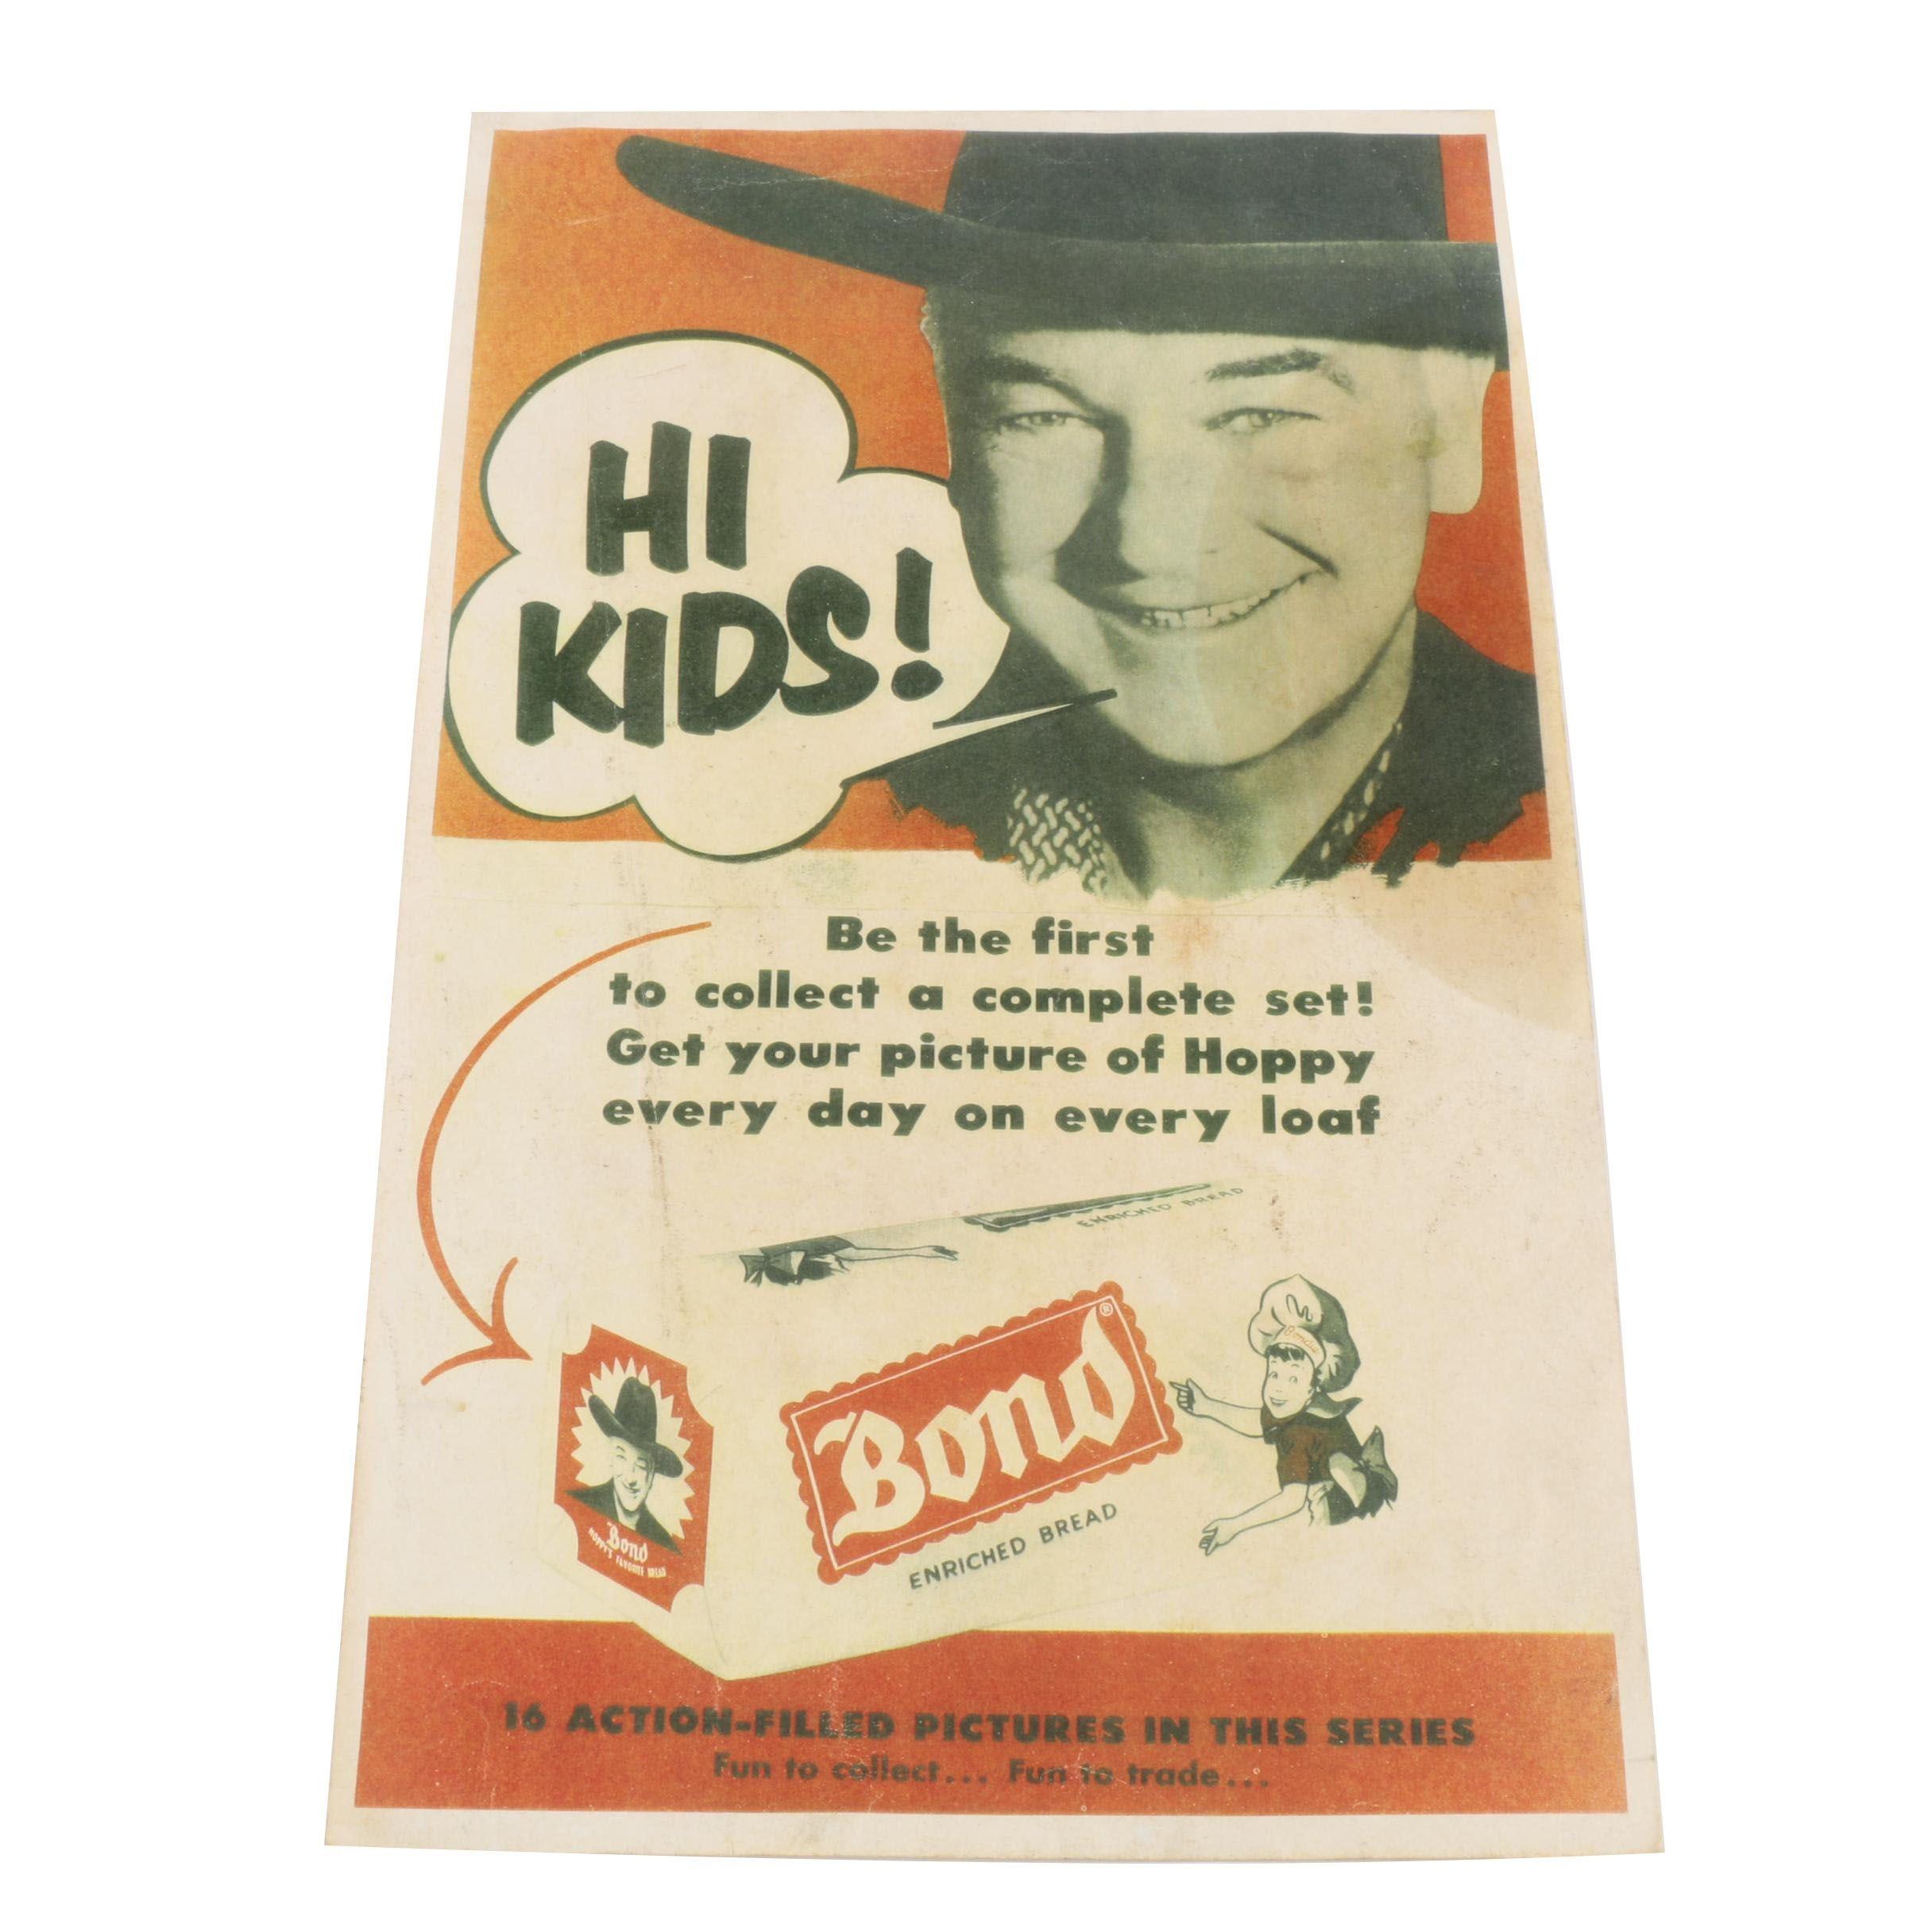 Vintage Hopalong Cassidy for Bond Enriched Bread Poster